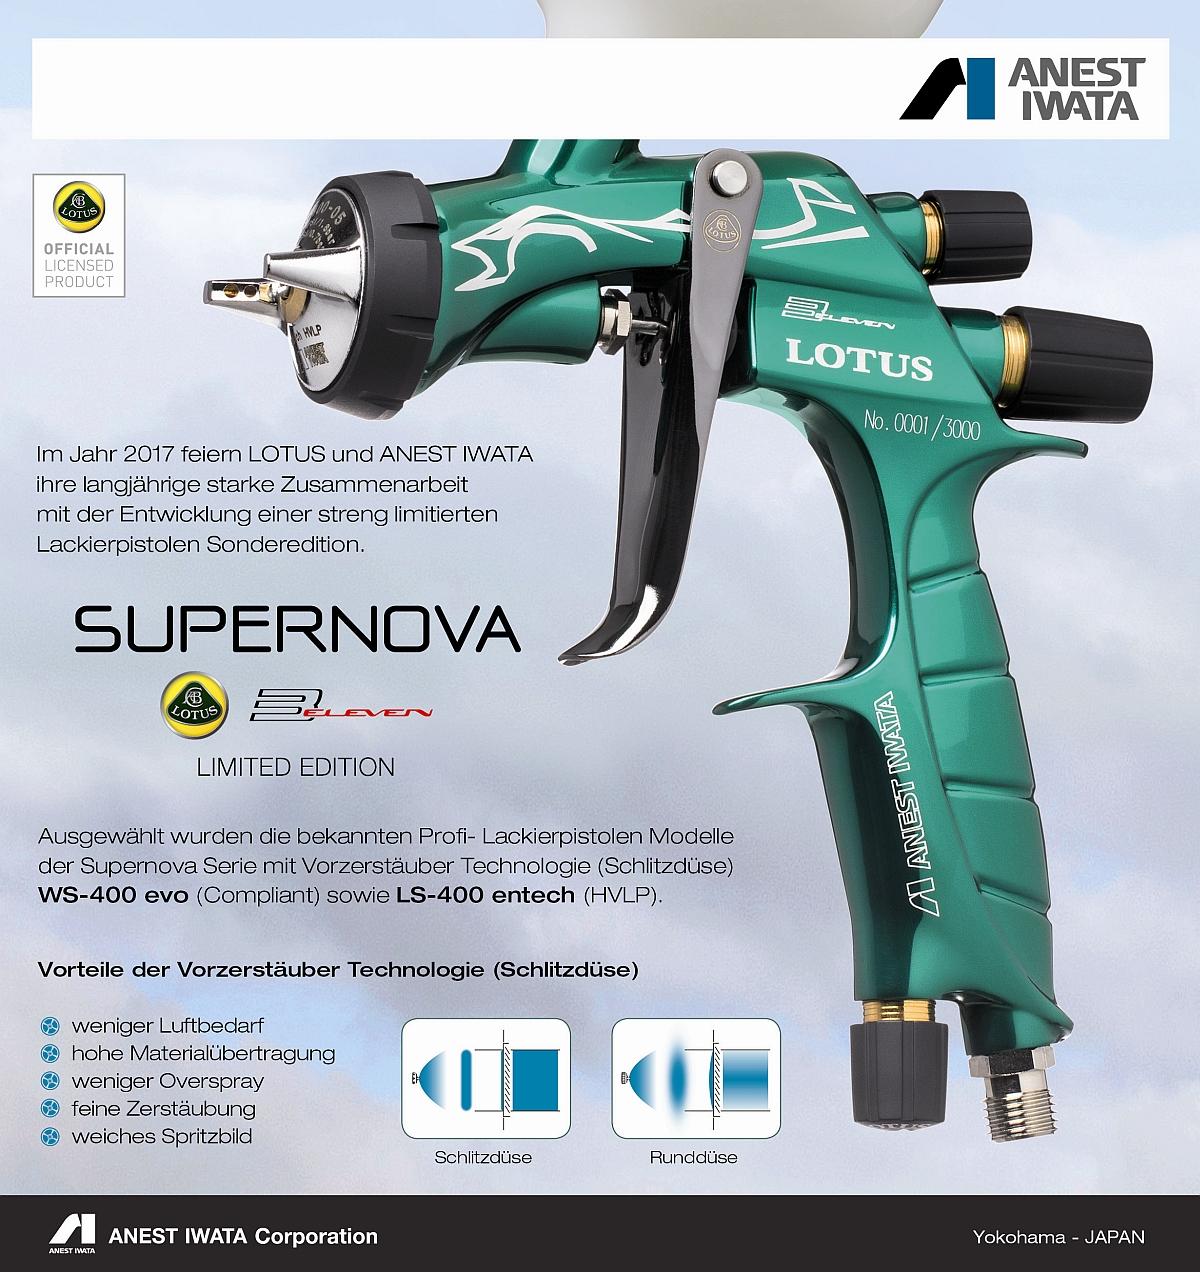 anest-iwata-neues-sondermodel-supernova-lotus-3-eleven